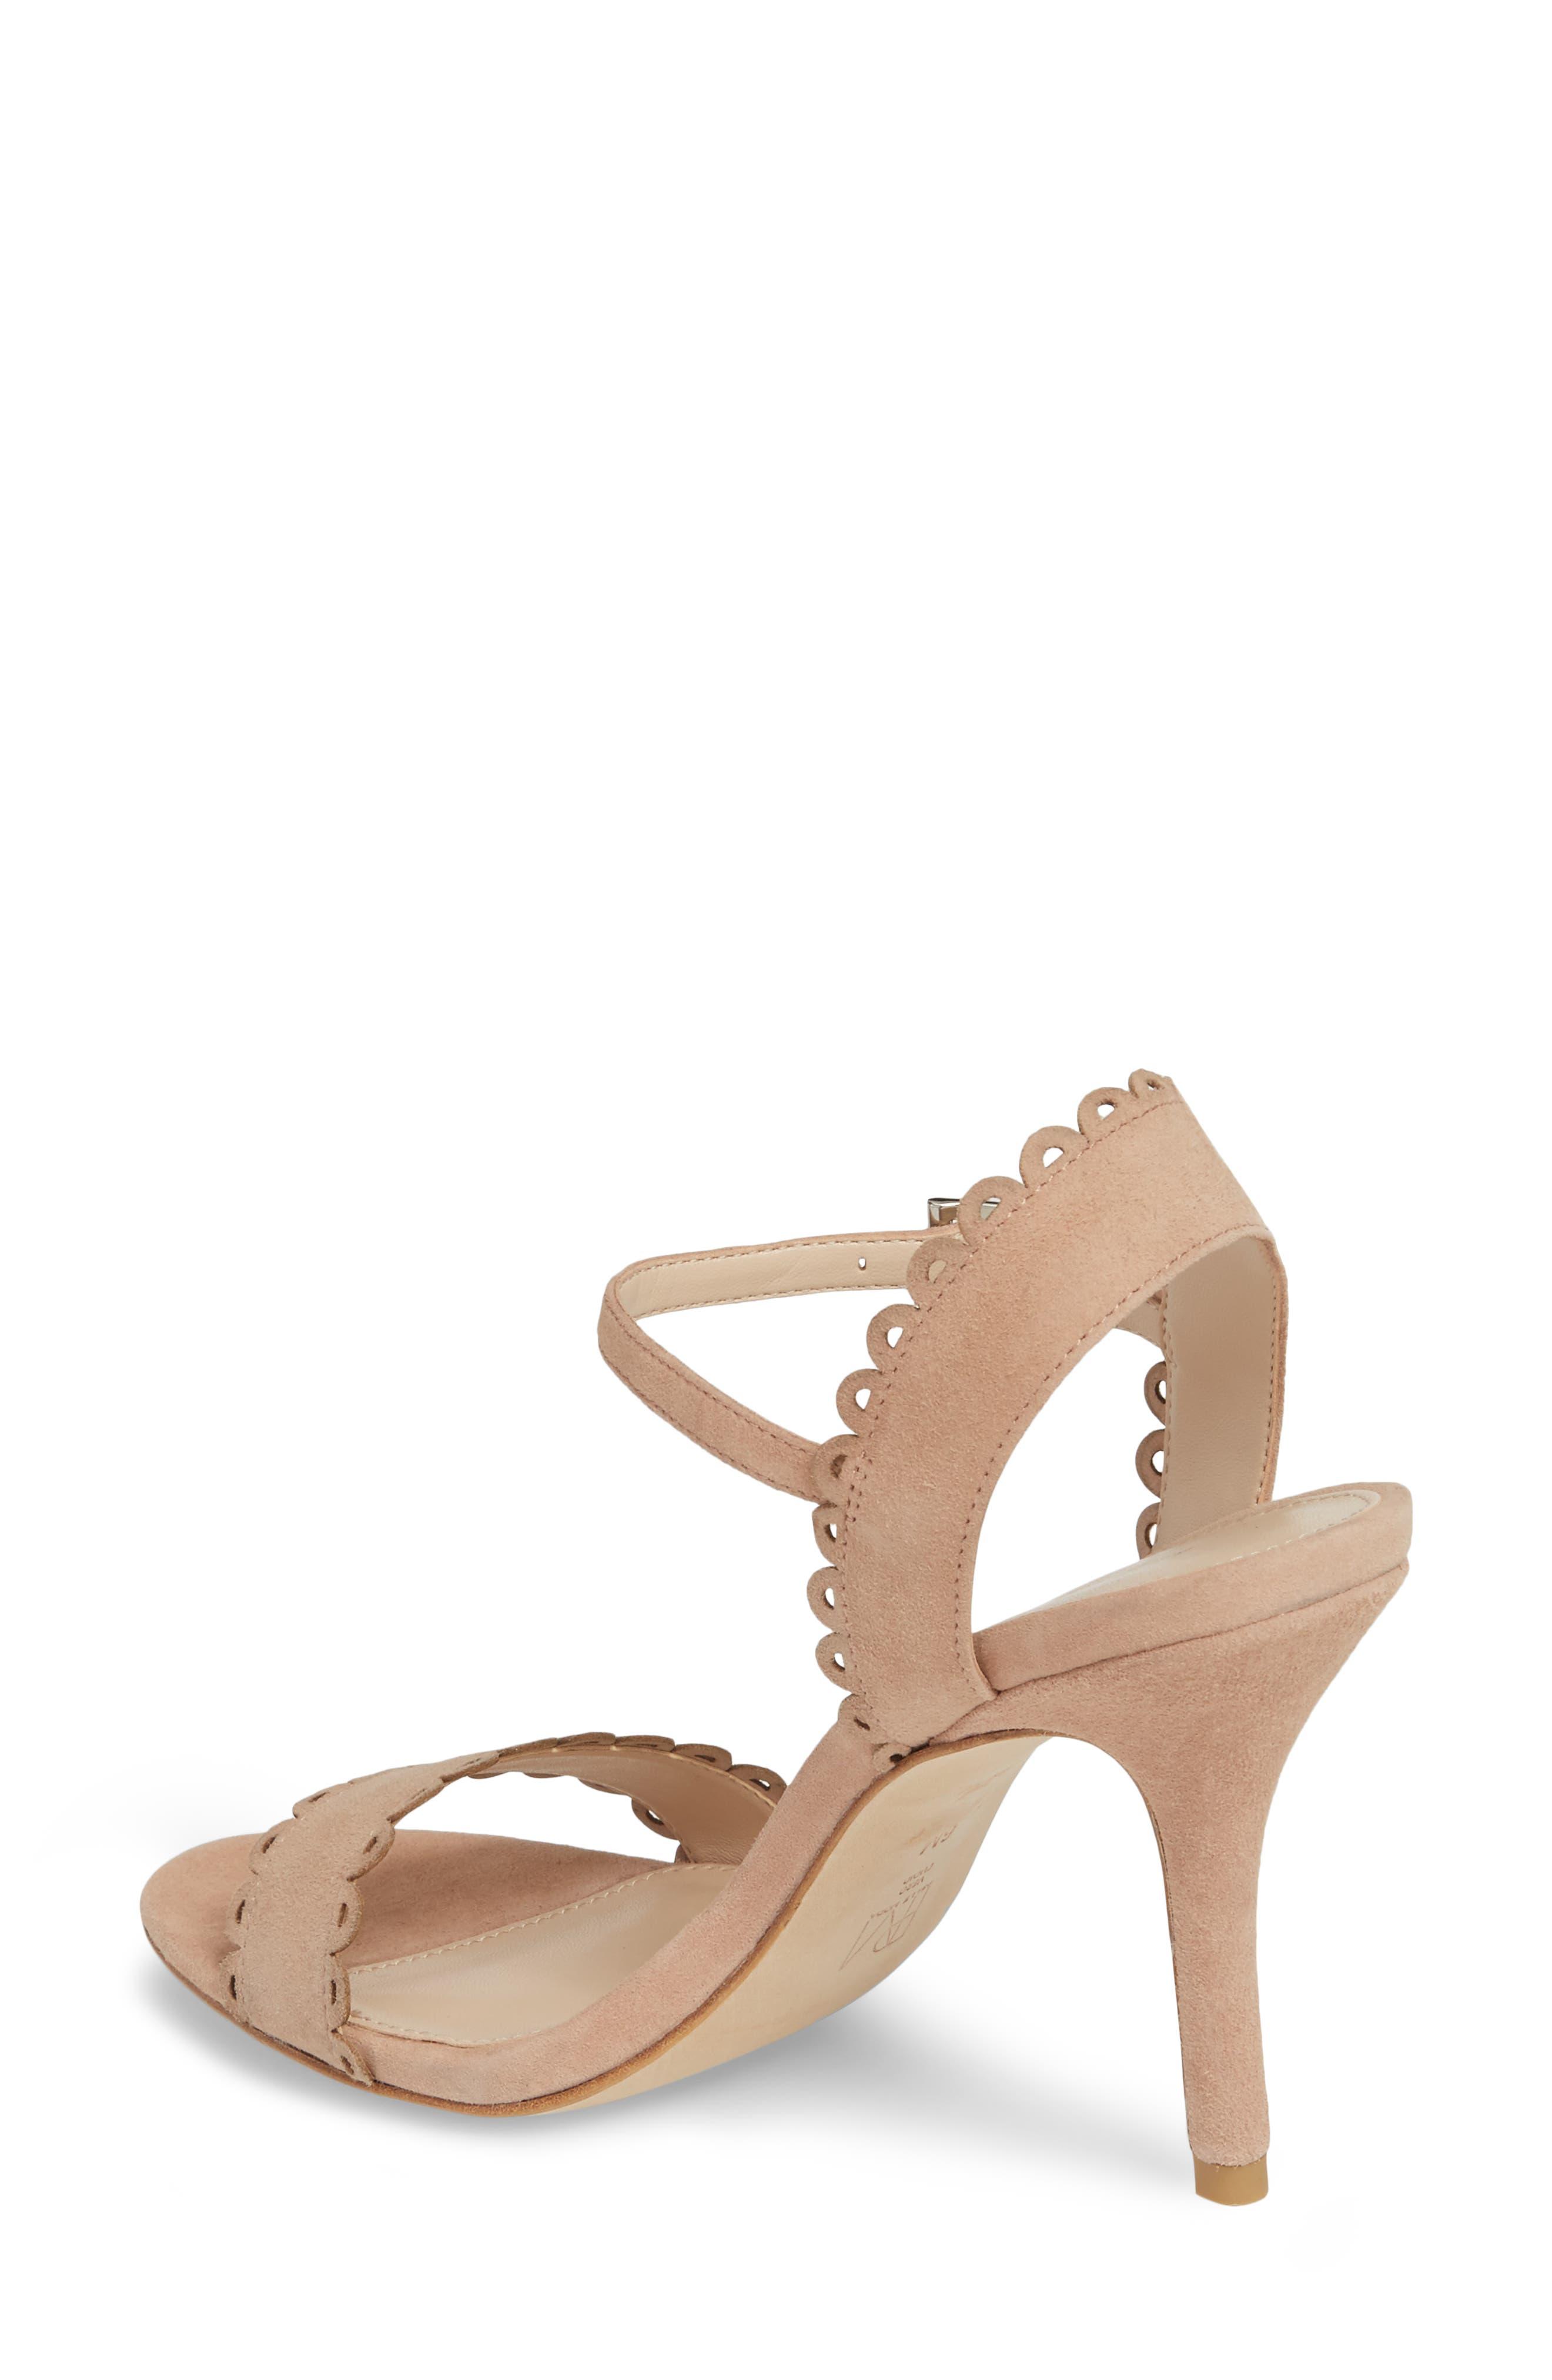 Karen Scallop Ankle Strap Sandal,                             Alternate thumbnail 6, color,